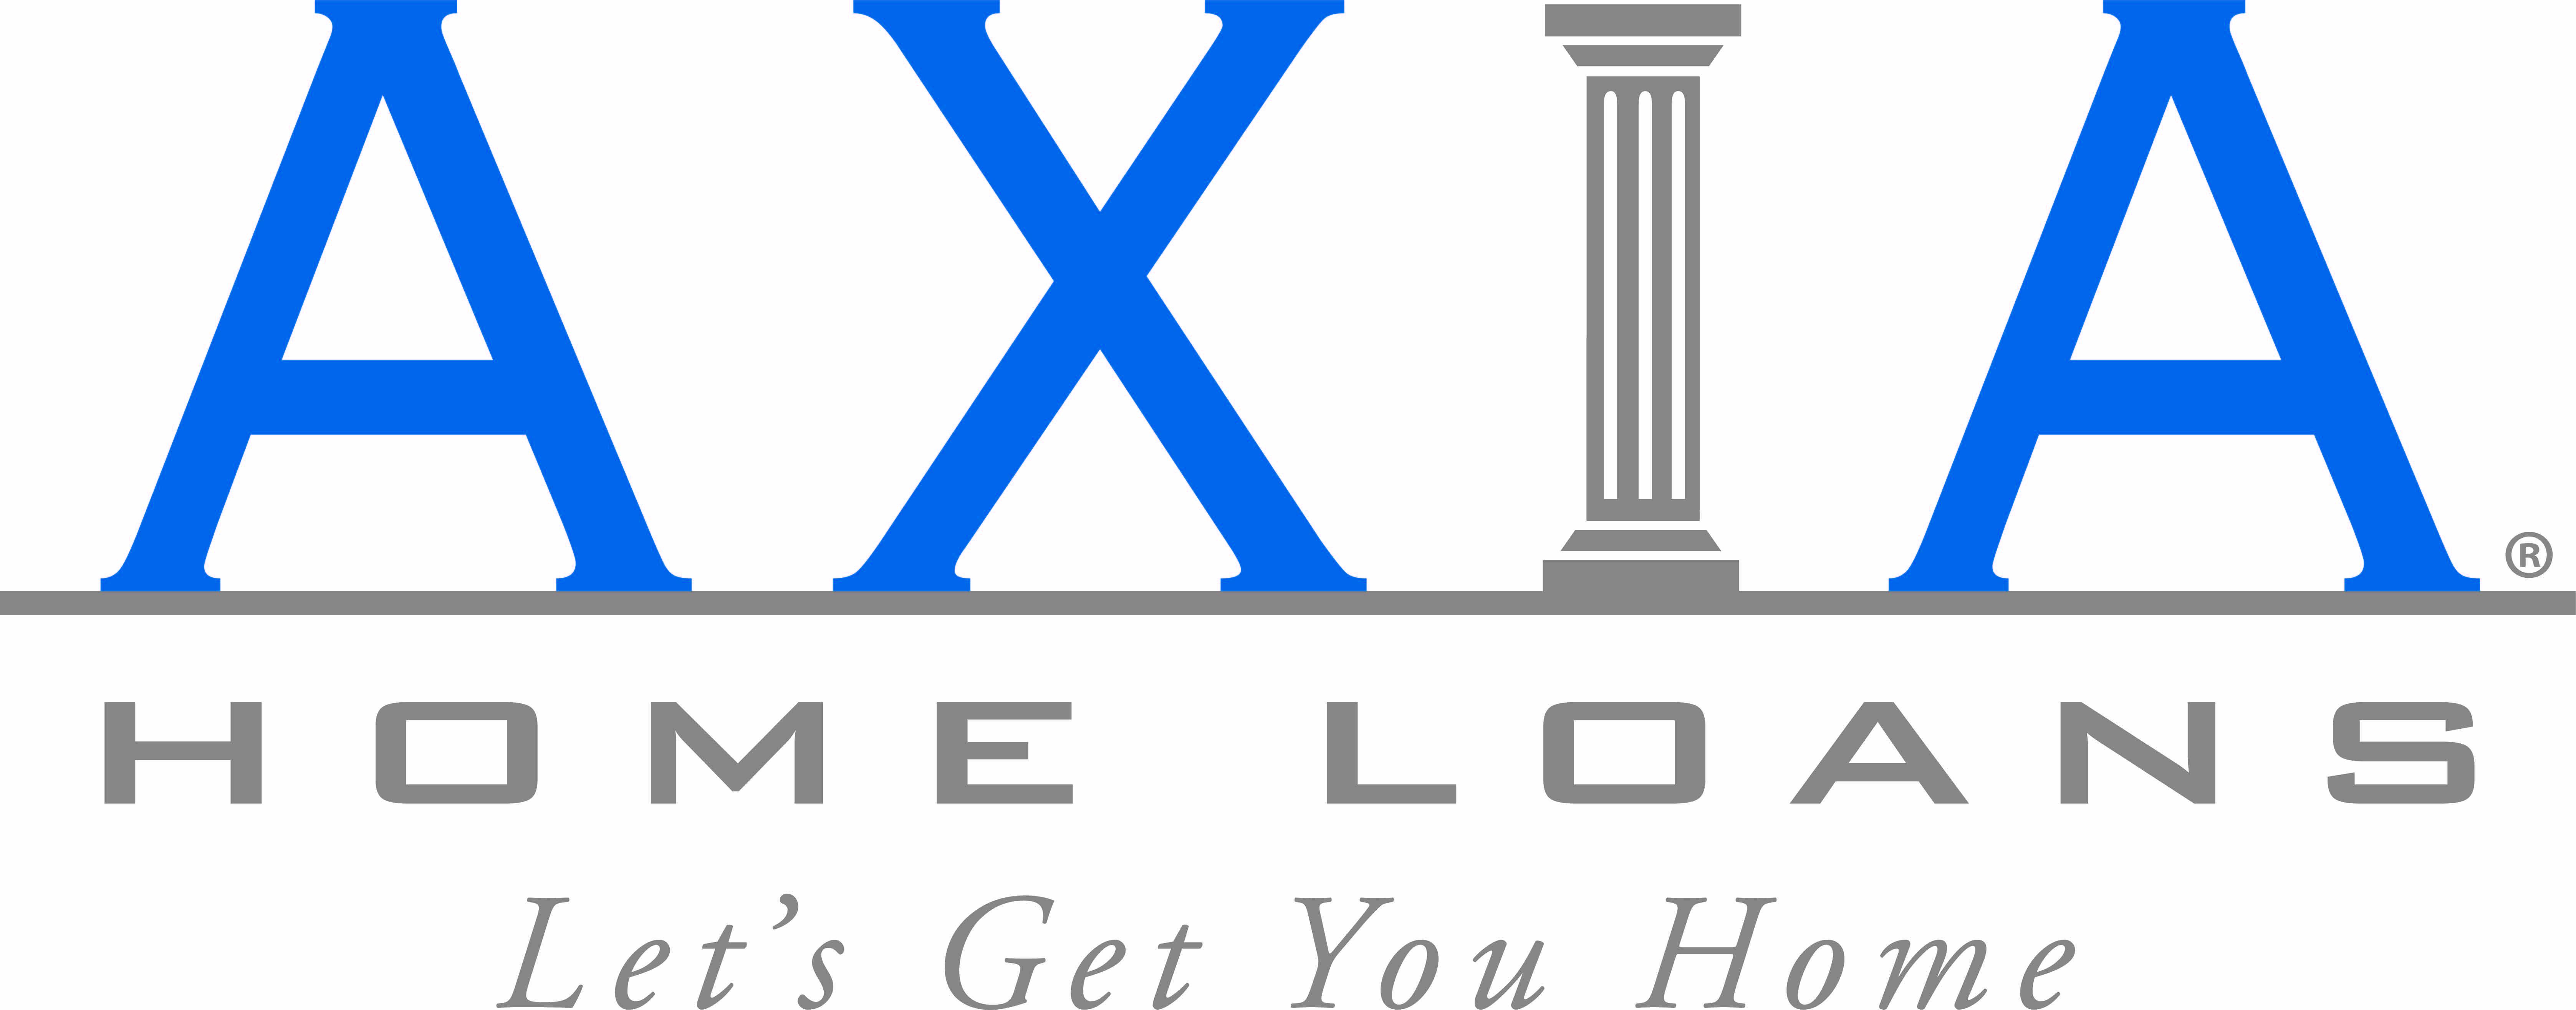 Axia Home Loan